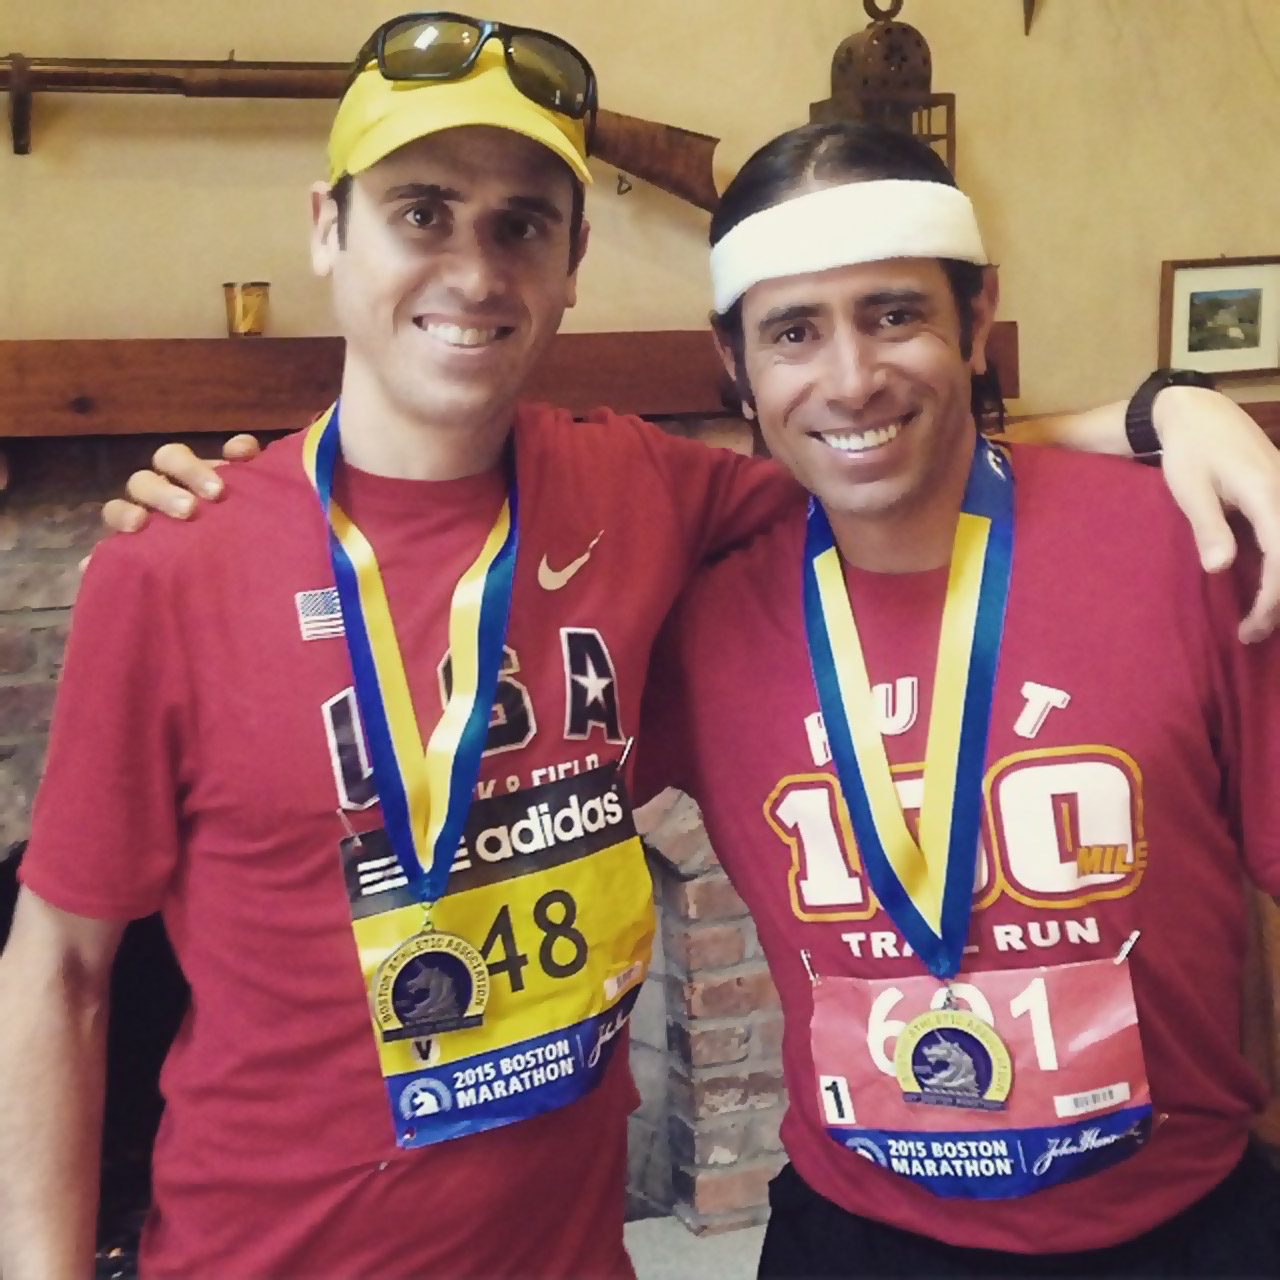 'America's Got Talent' mentalist and ultra-marathoner Oz Pearlman